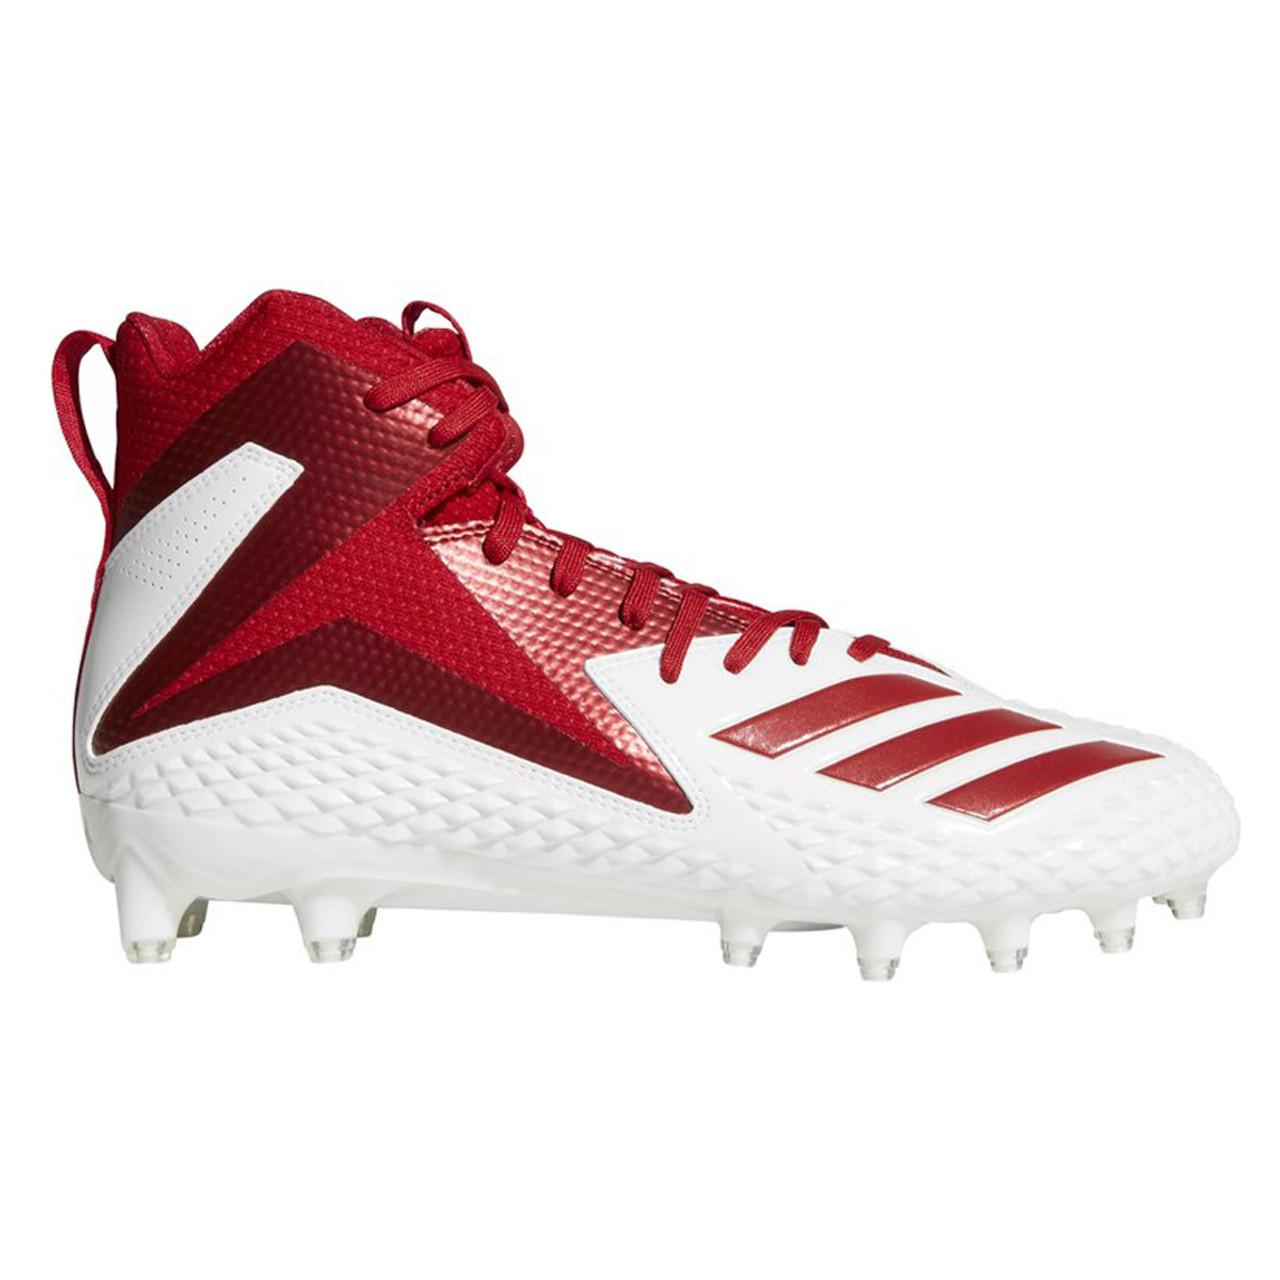 Adidas Freak X Carbon Mid Men's